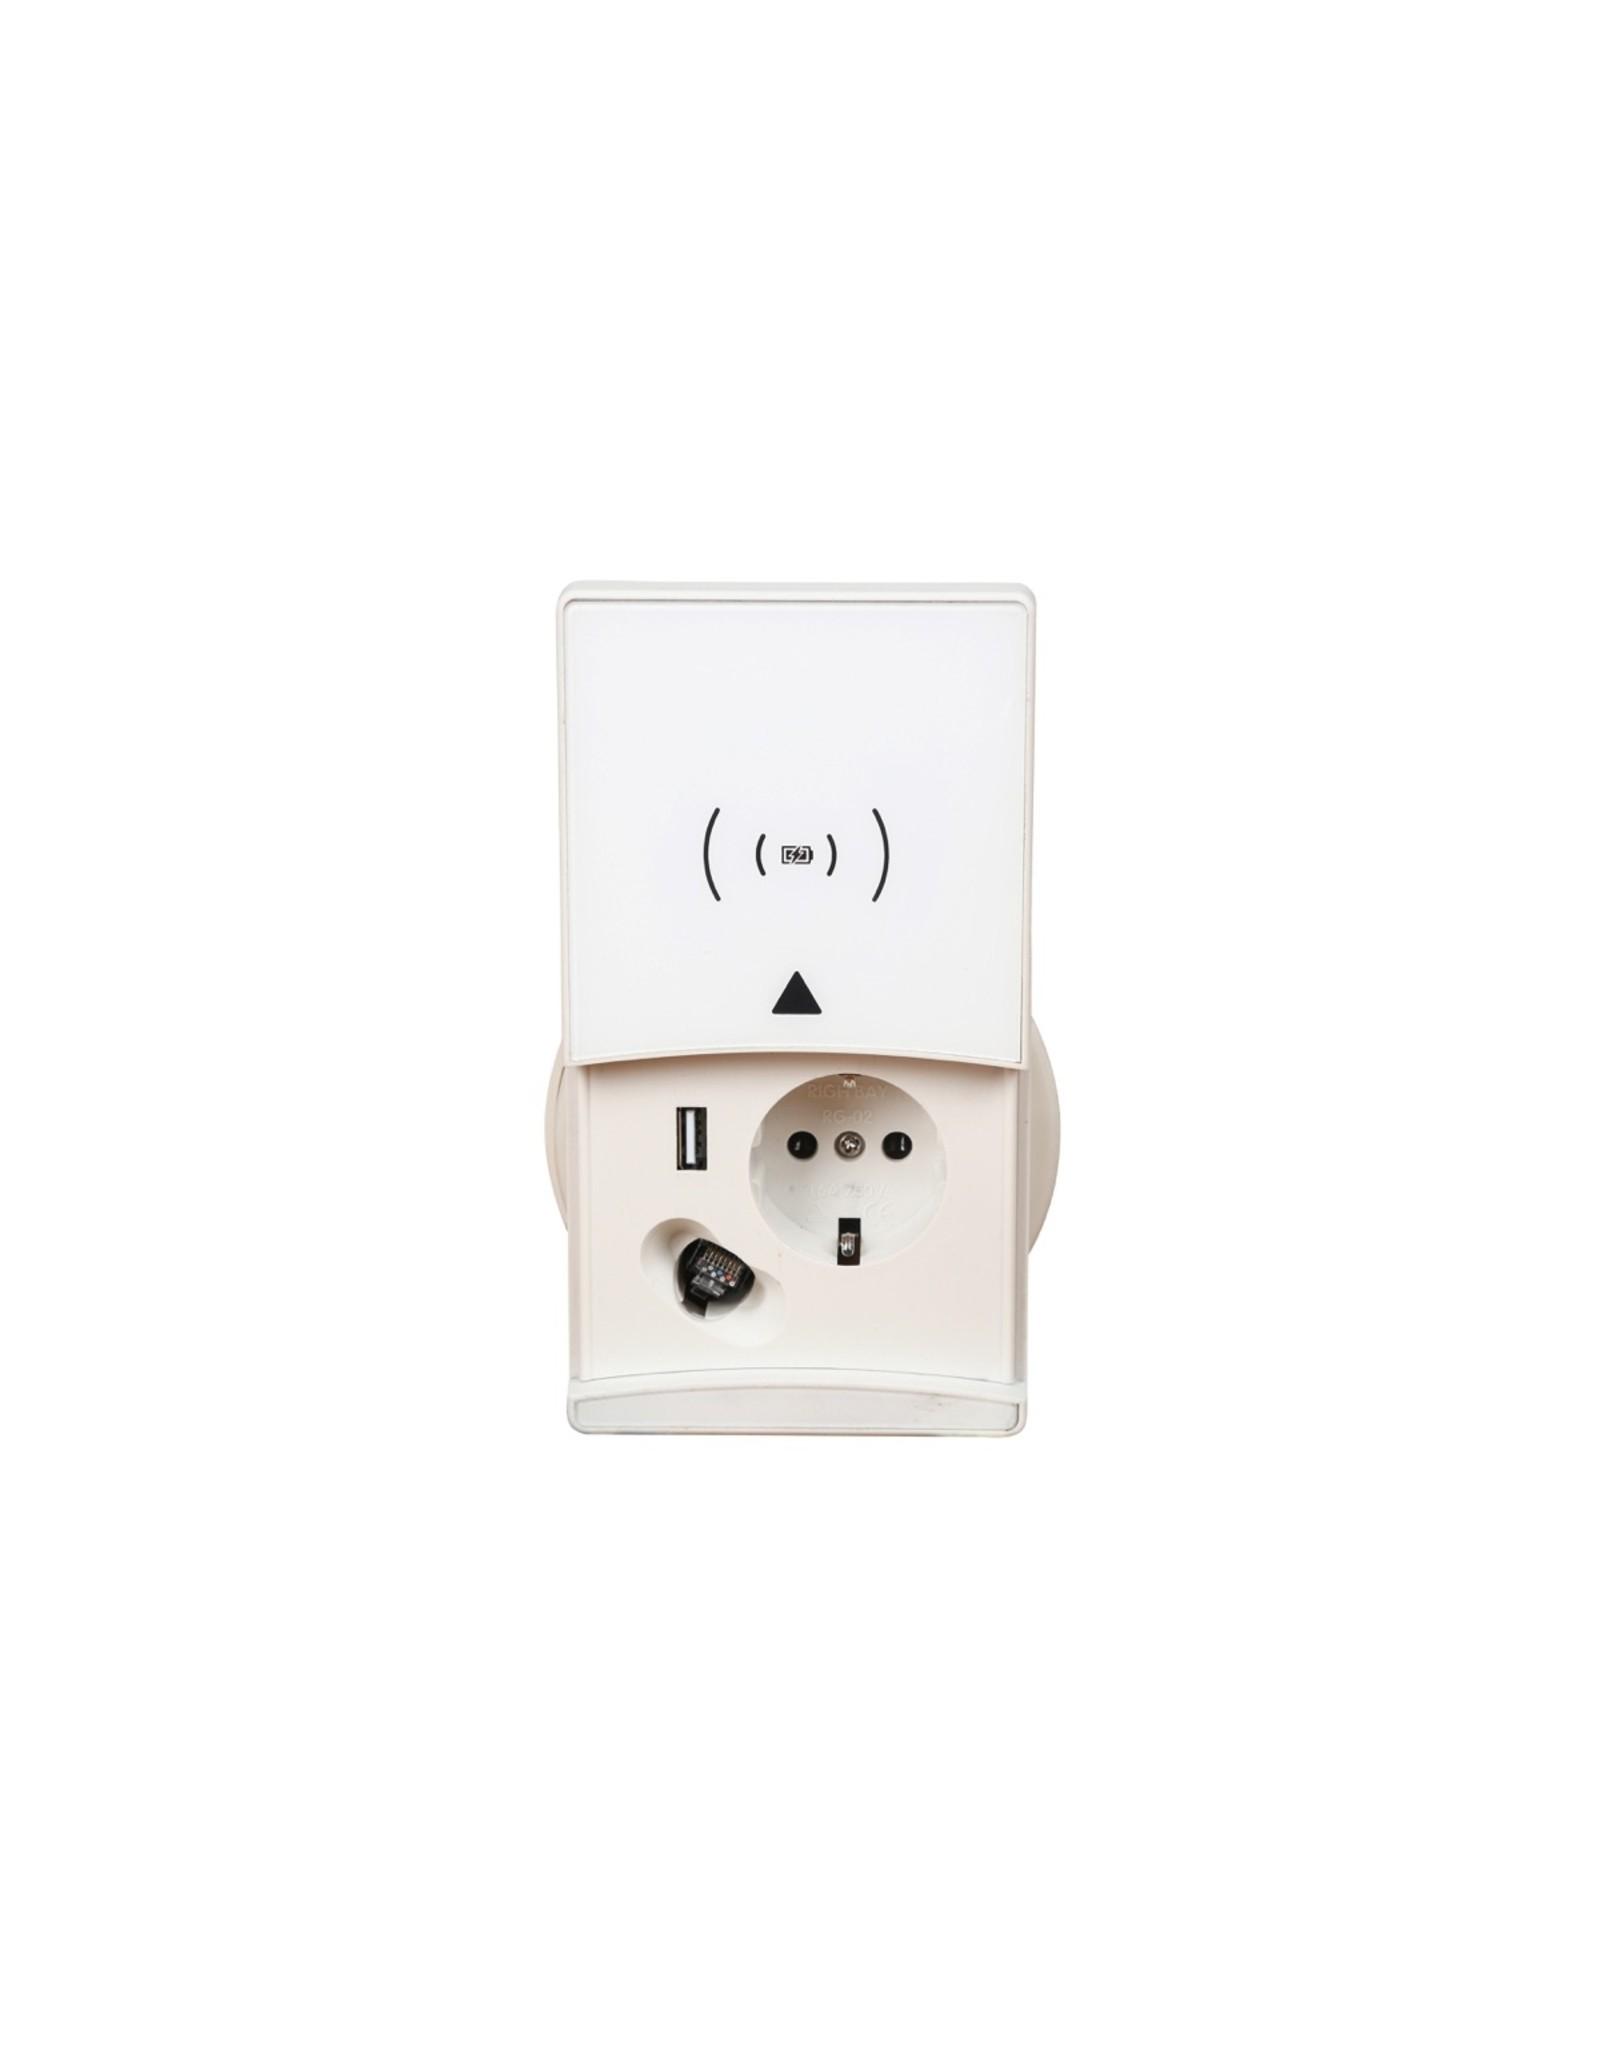 Filex QI-charger - 230V - USB-charger - CAT6